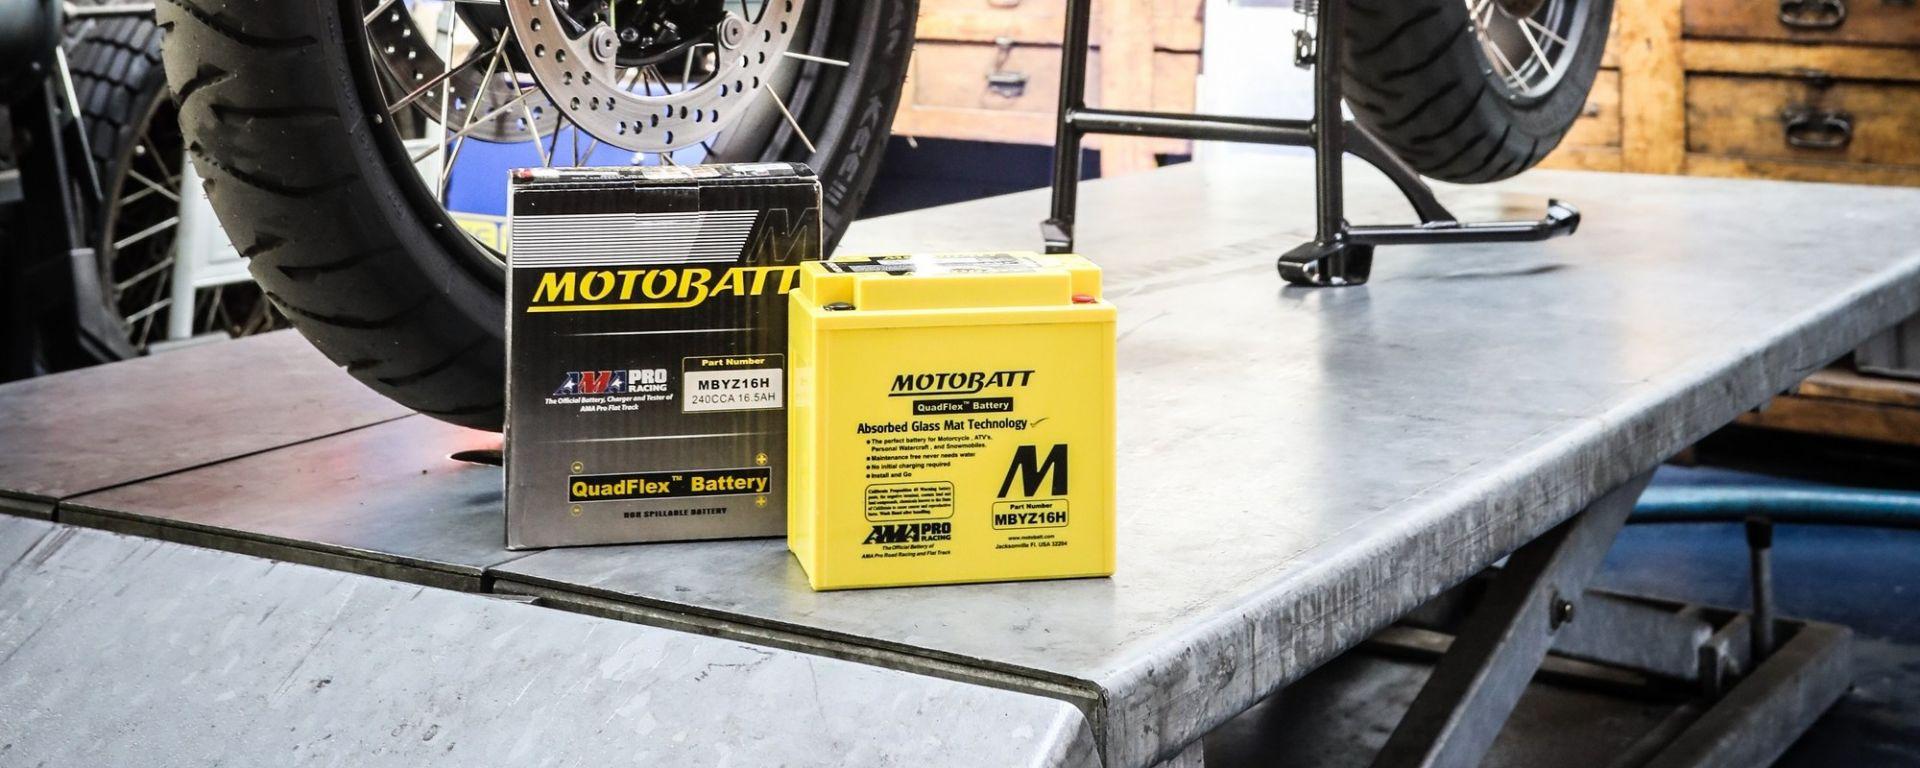 AGM Motobatt pronta per l'uso